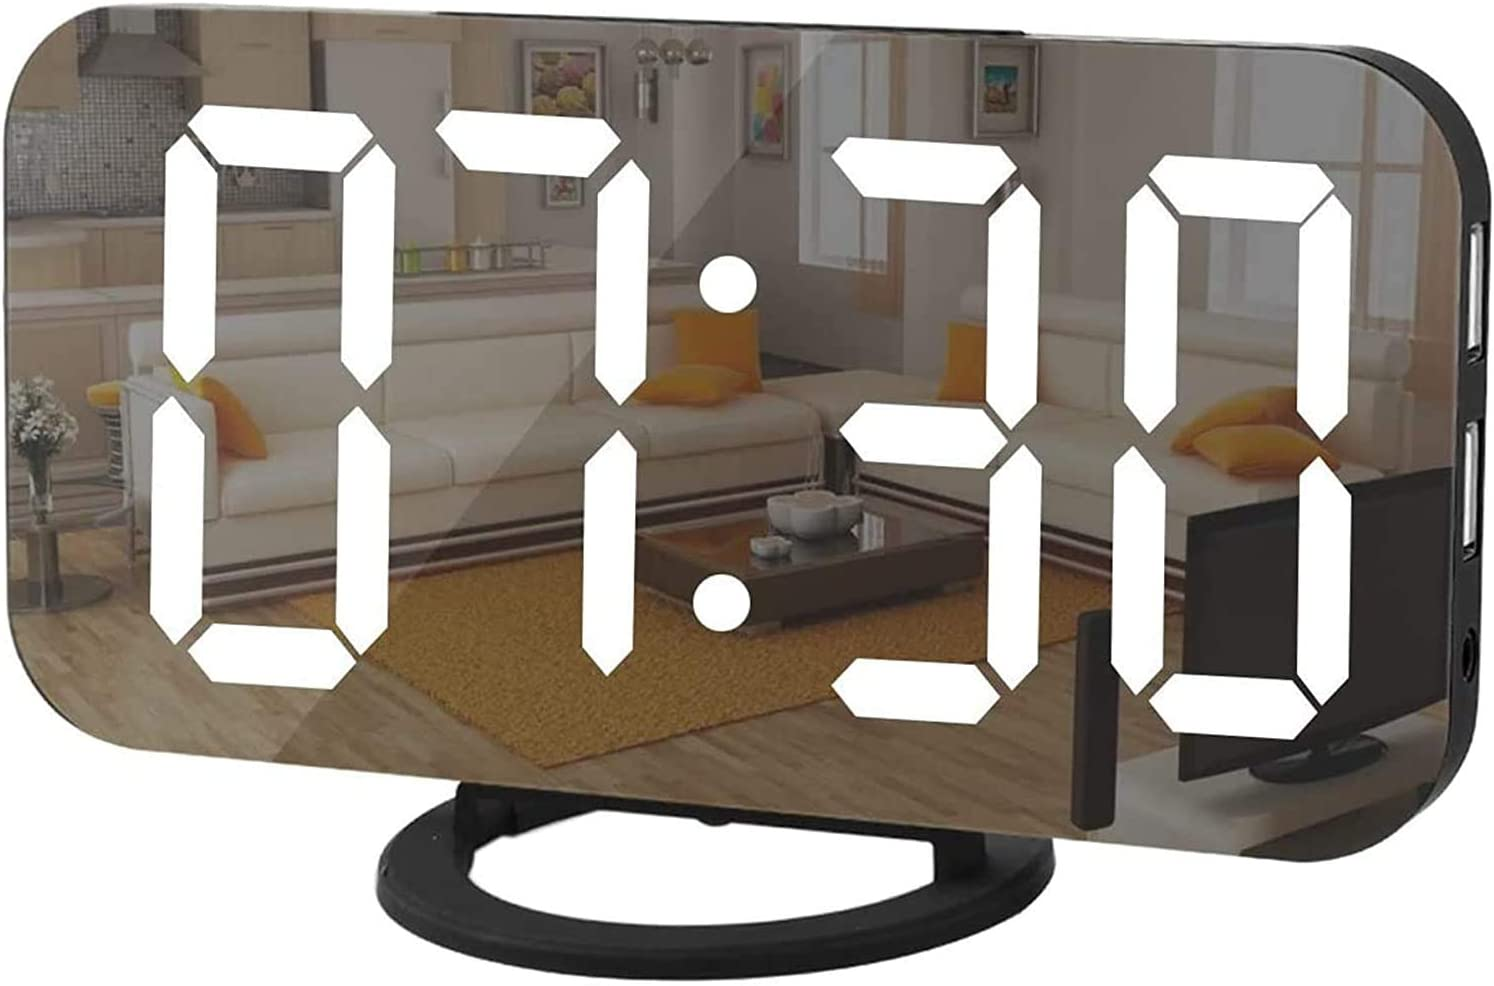 HowiseAcc LED Digital Alarm Clock,Portable LED Mirror Alarm Clocks with 2 USB Port,6.5